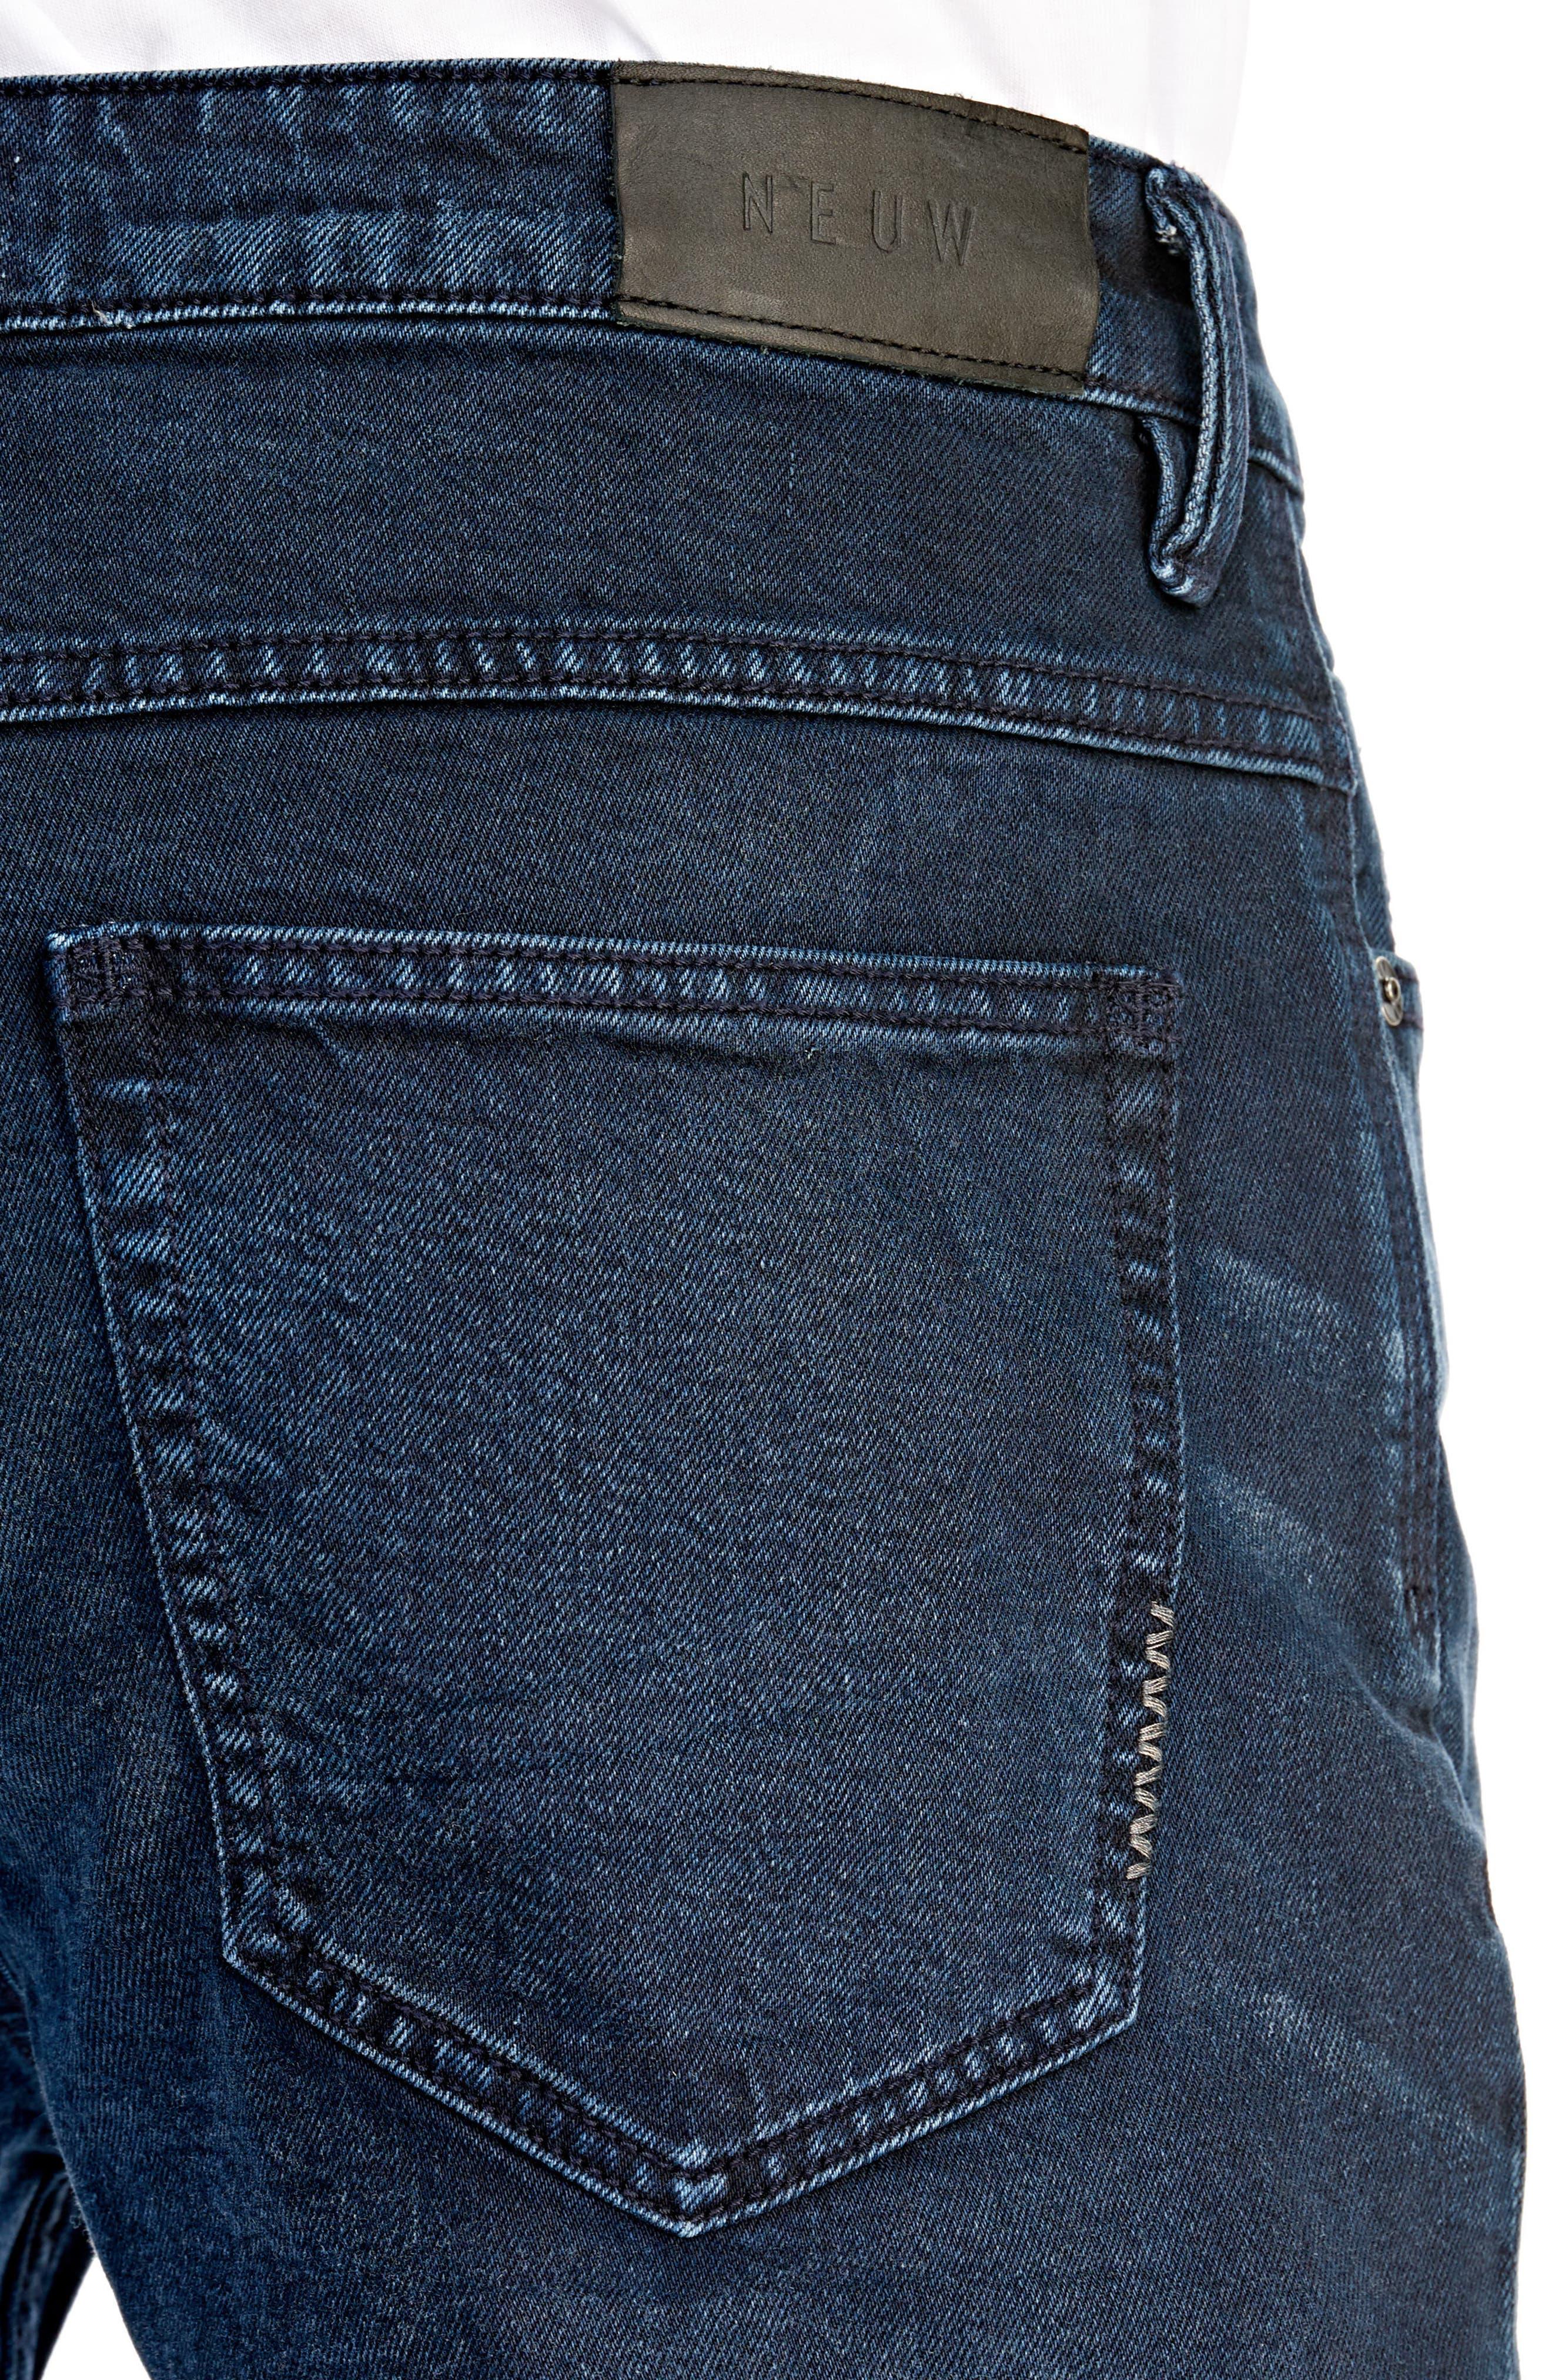 Lou Slim Fit Jeans,                             Alternate thumbnail 4, color,                             ZYDECO